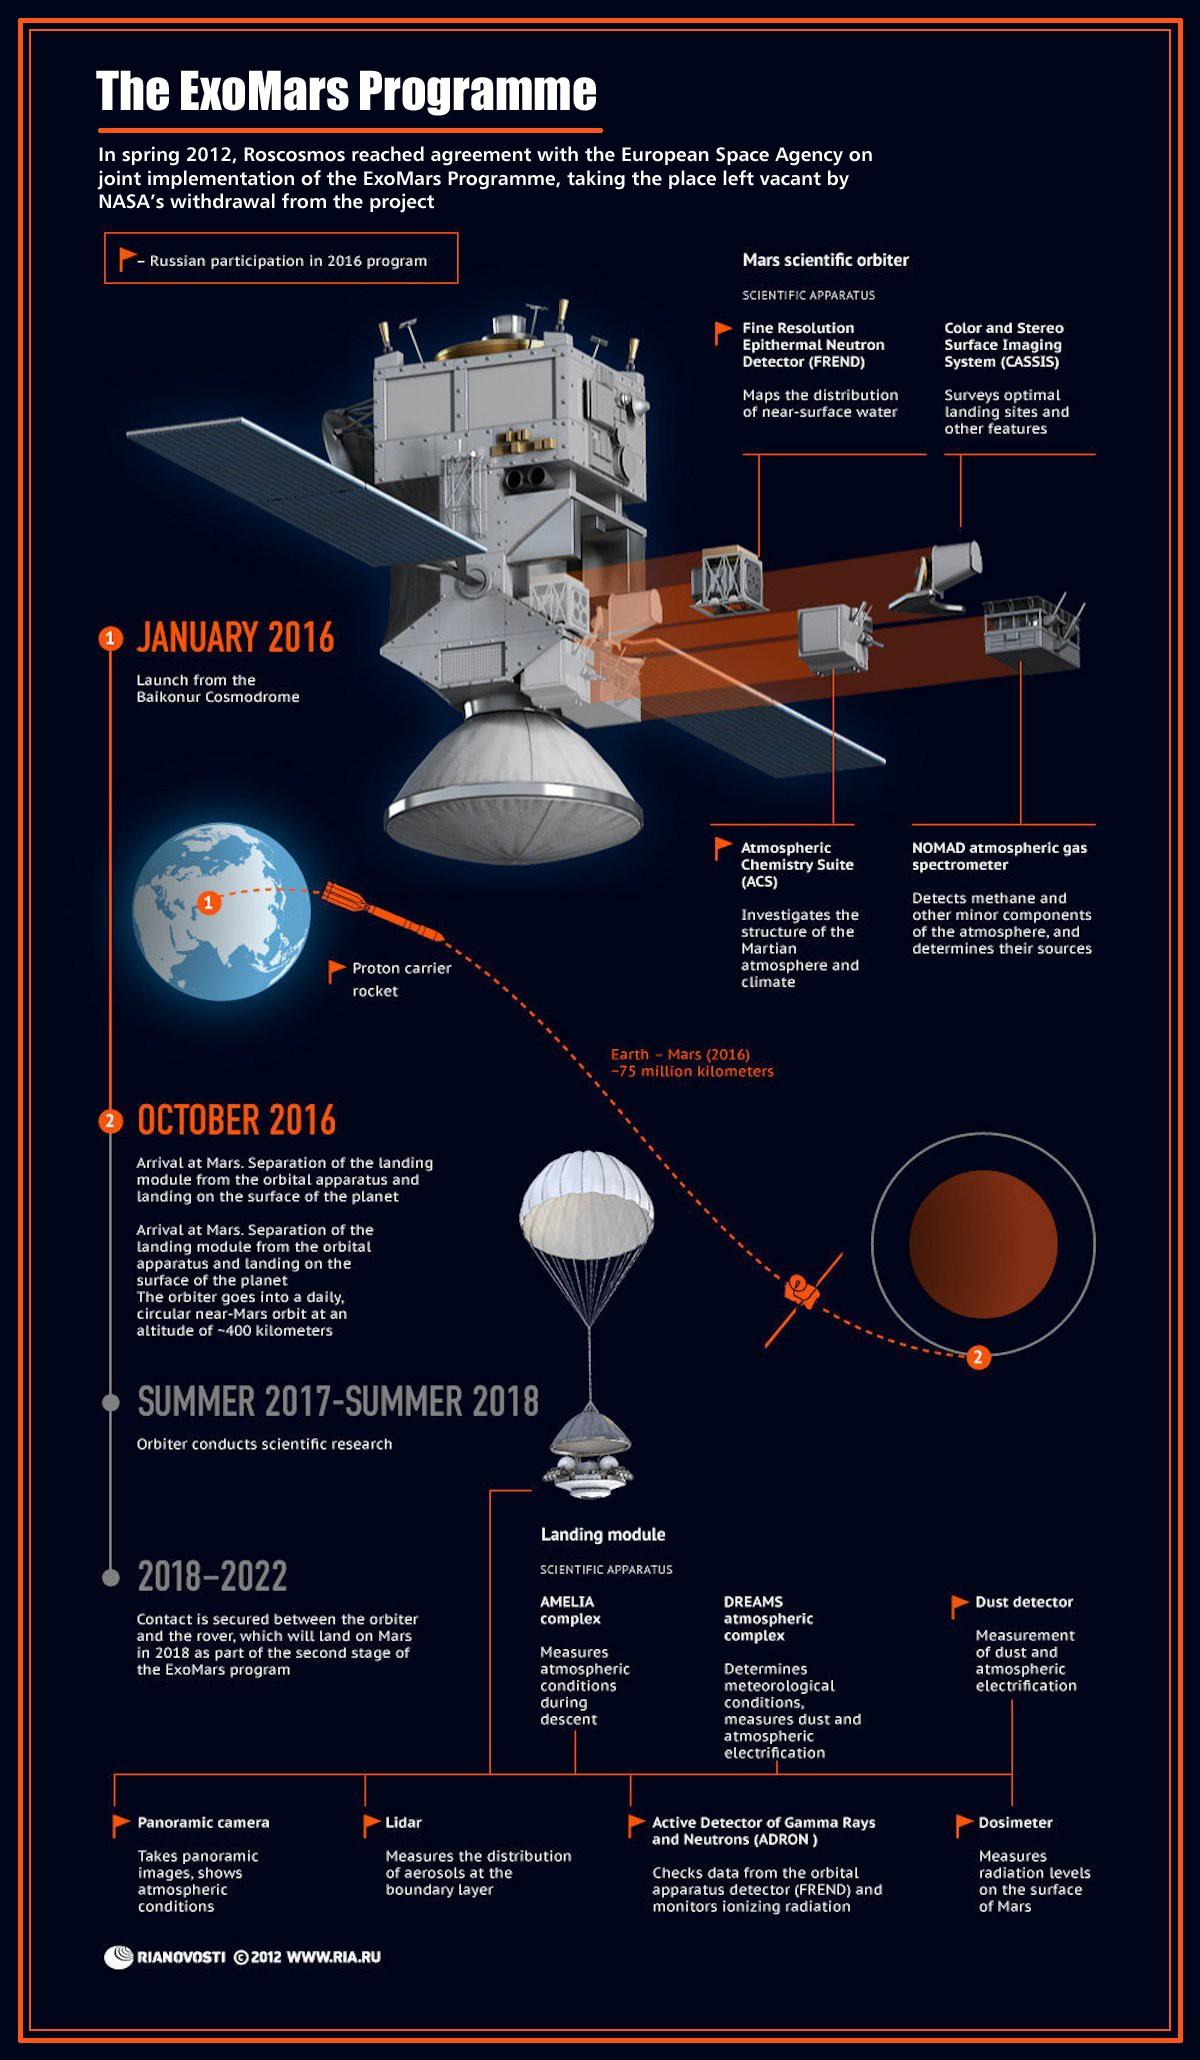 00 RIA-Novosti Infographics. The ExoMars Programme. 2013